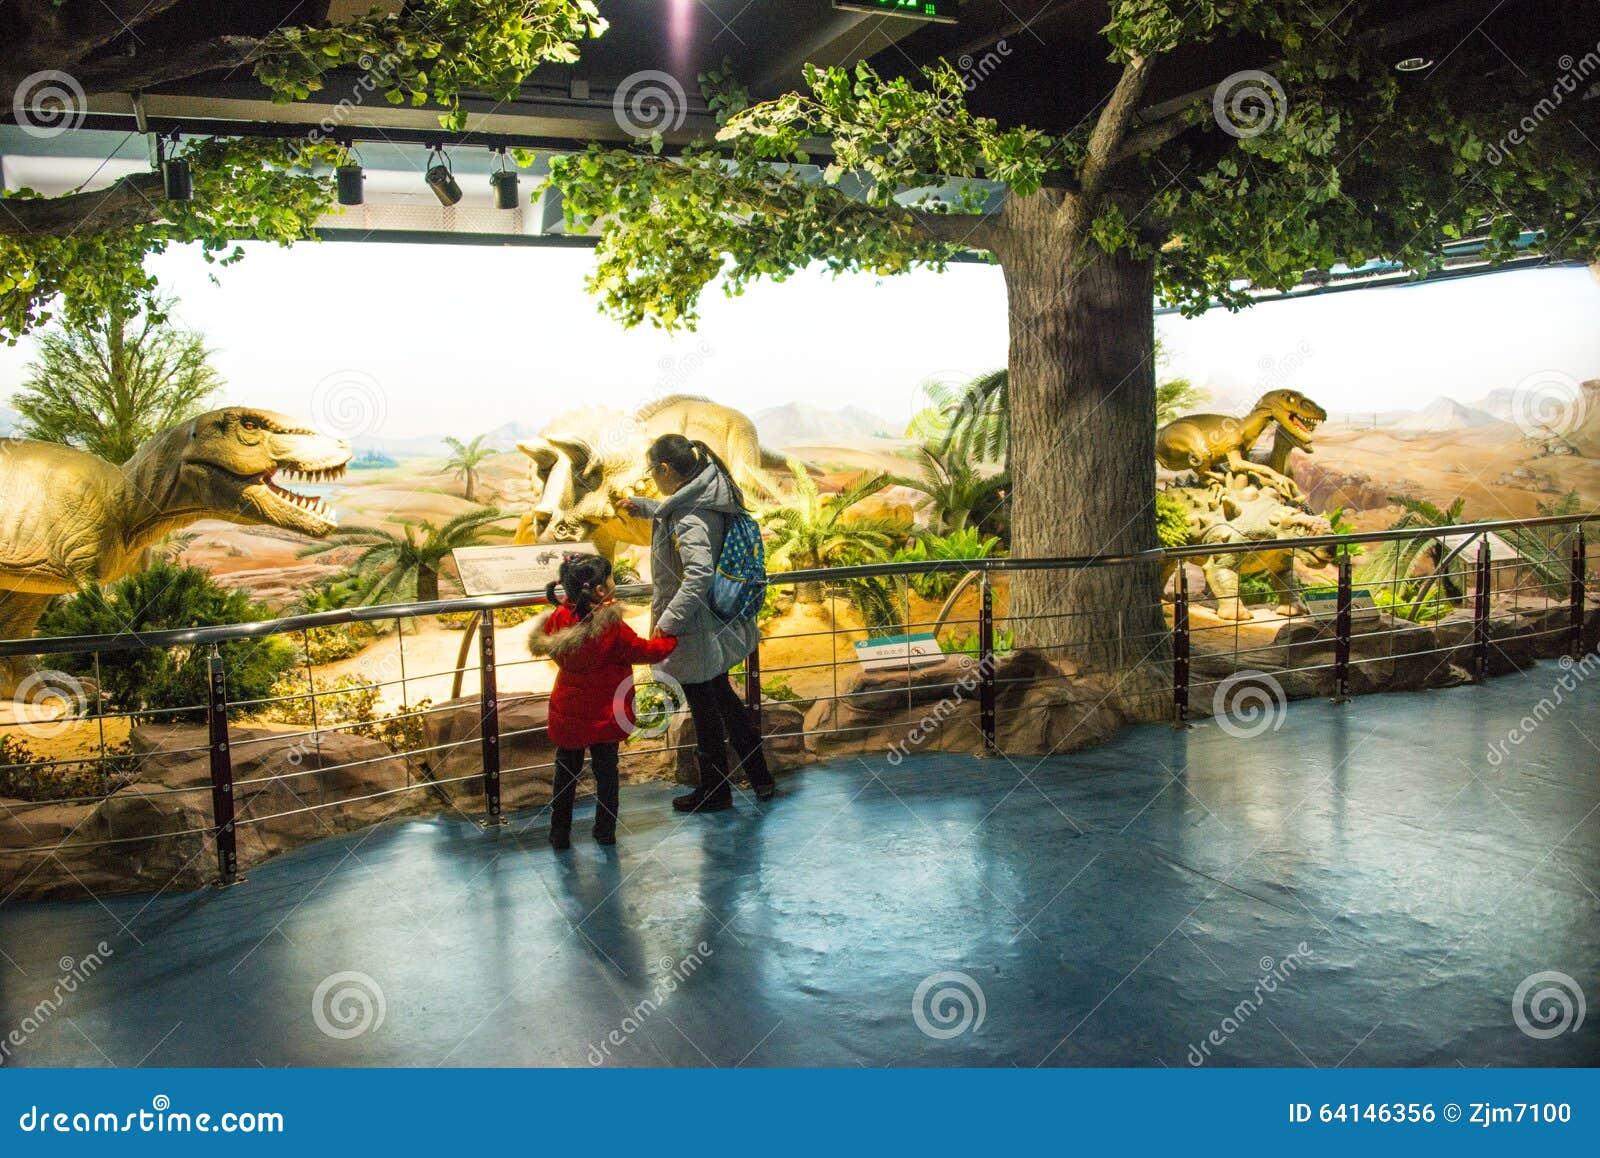 Natural History Museum Dinosaur Exhibition